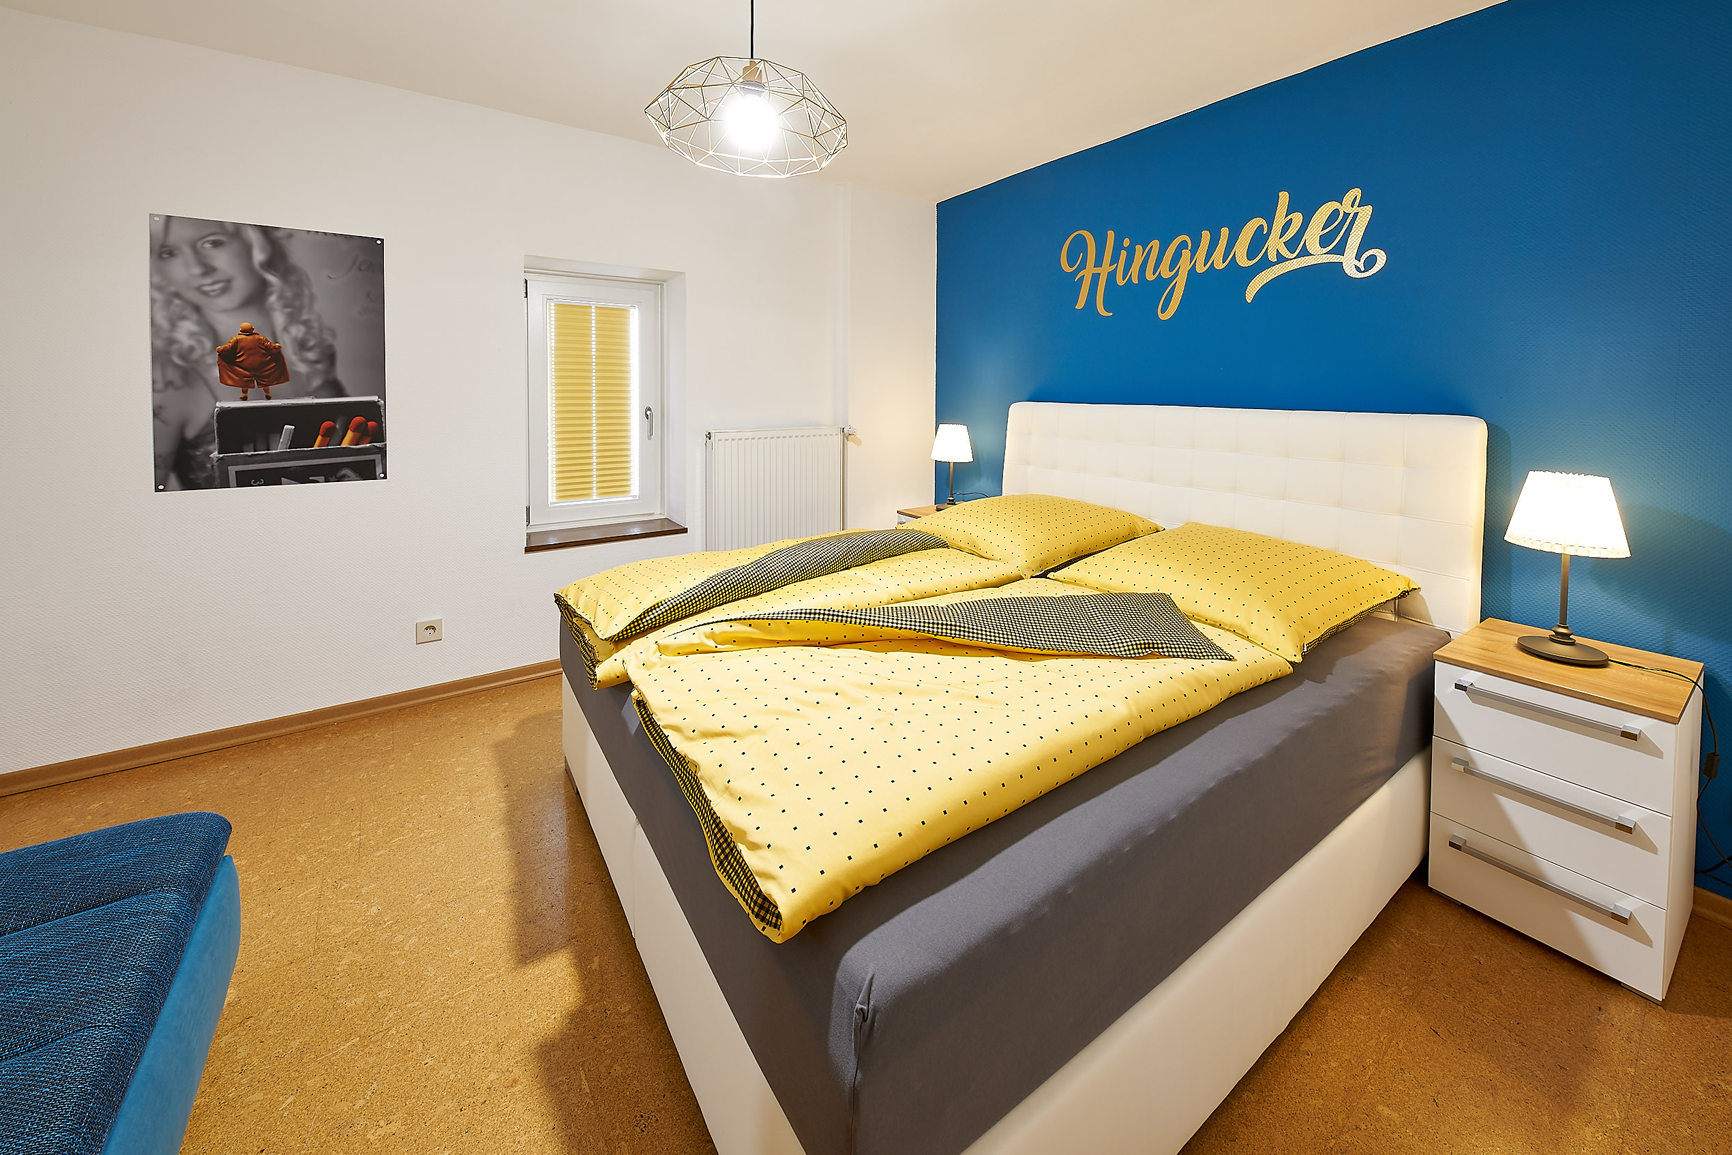 Mosel-Herberge Schlafzimmer Hingucker